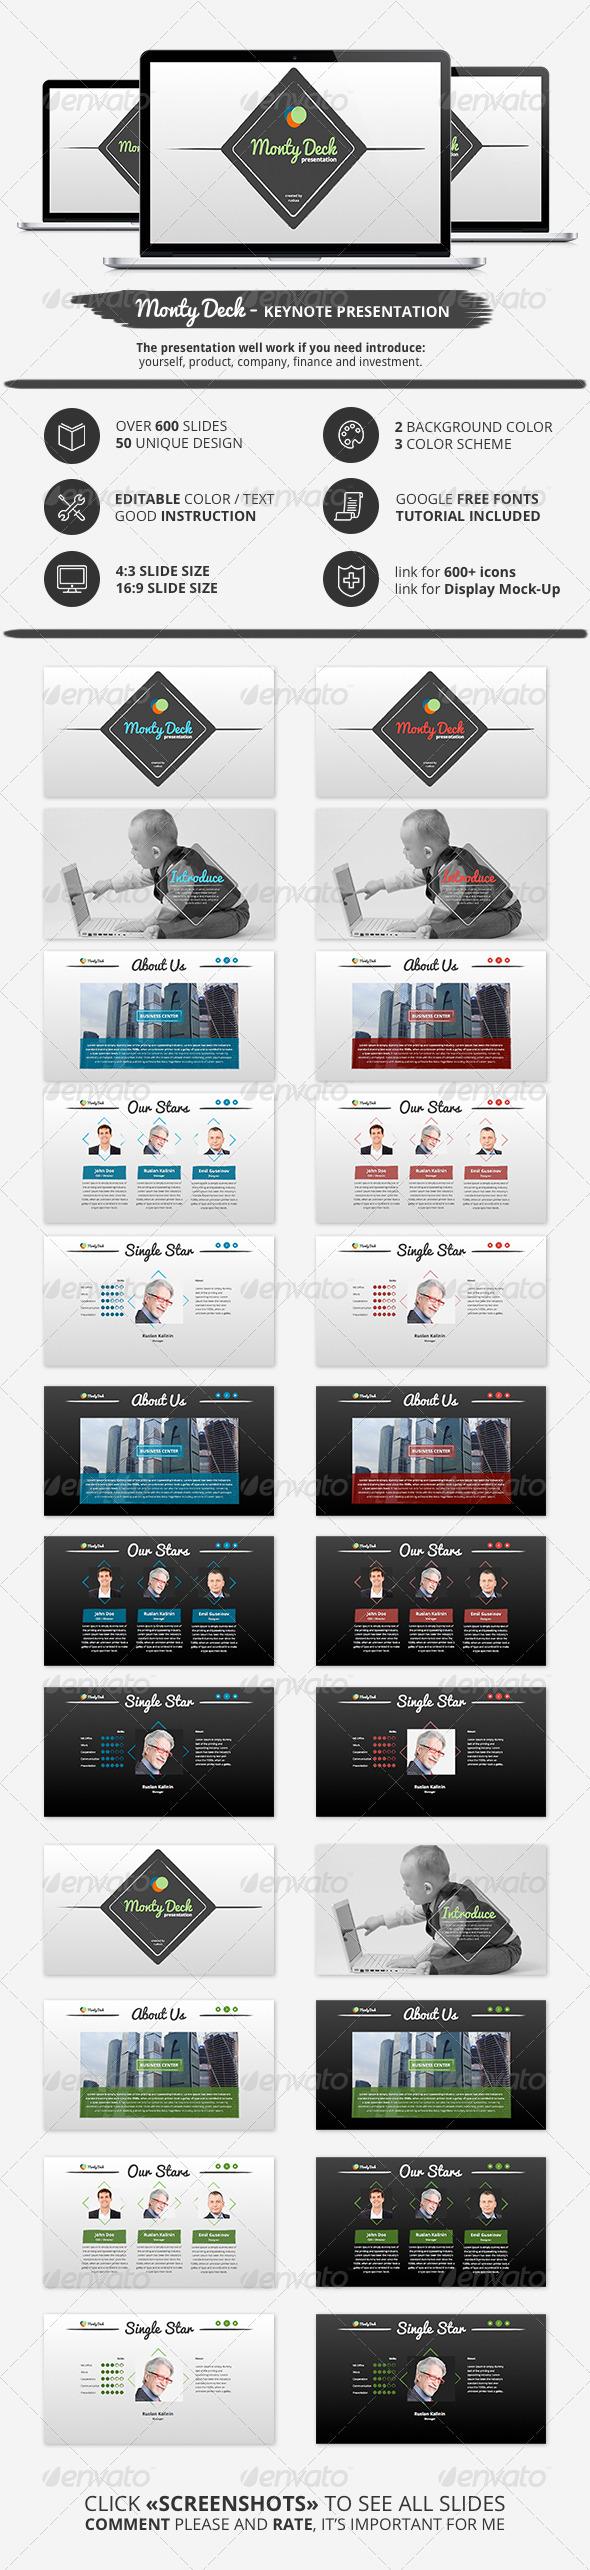 GraphicRiver Monty Deck Keynote Presentation 6478330